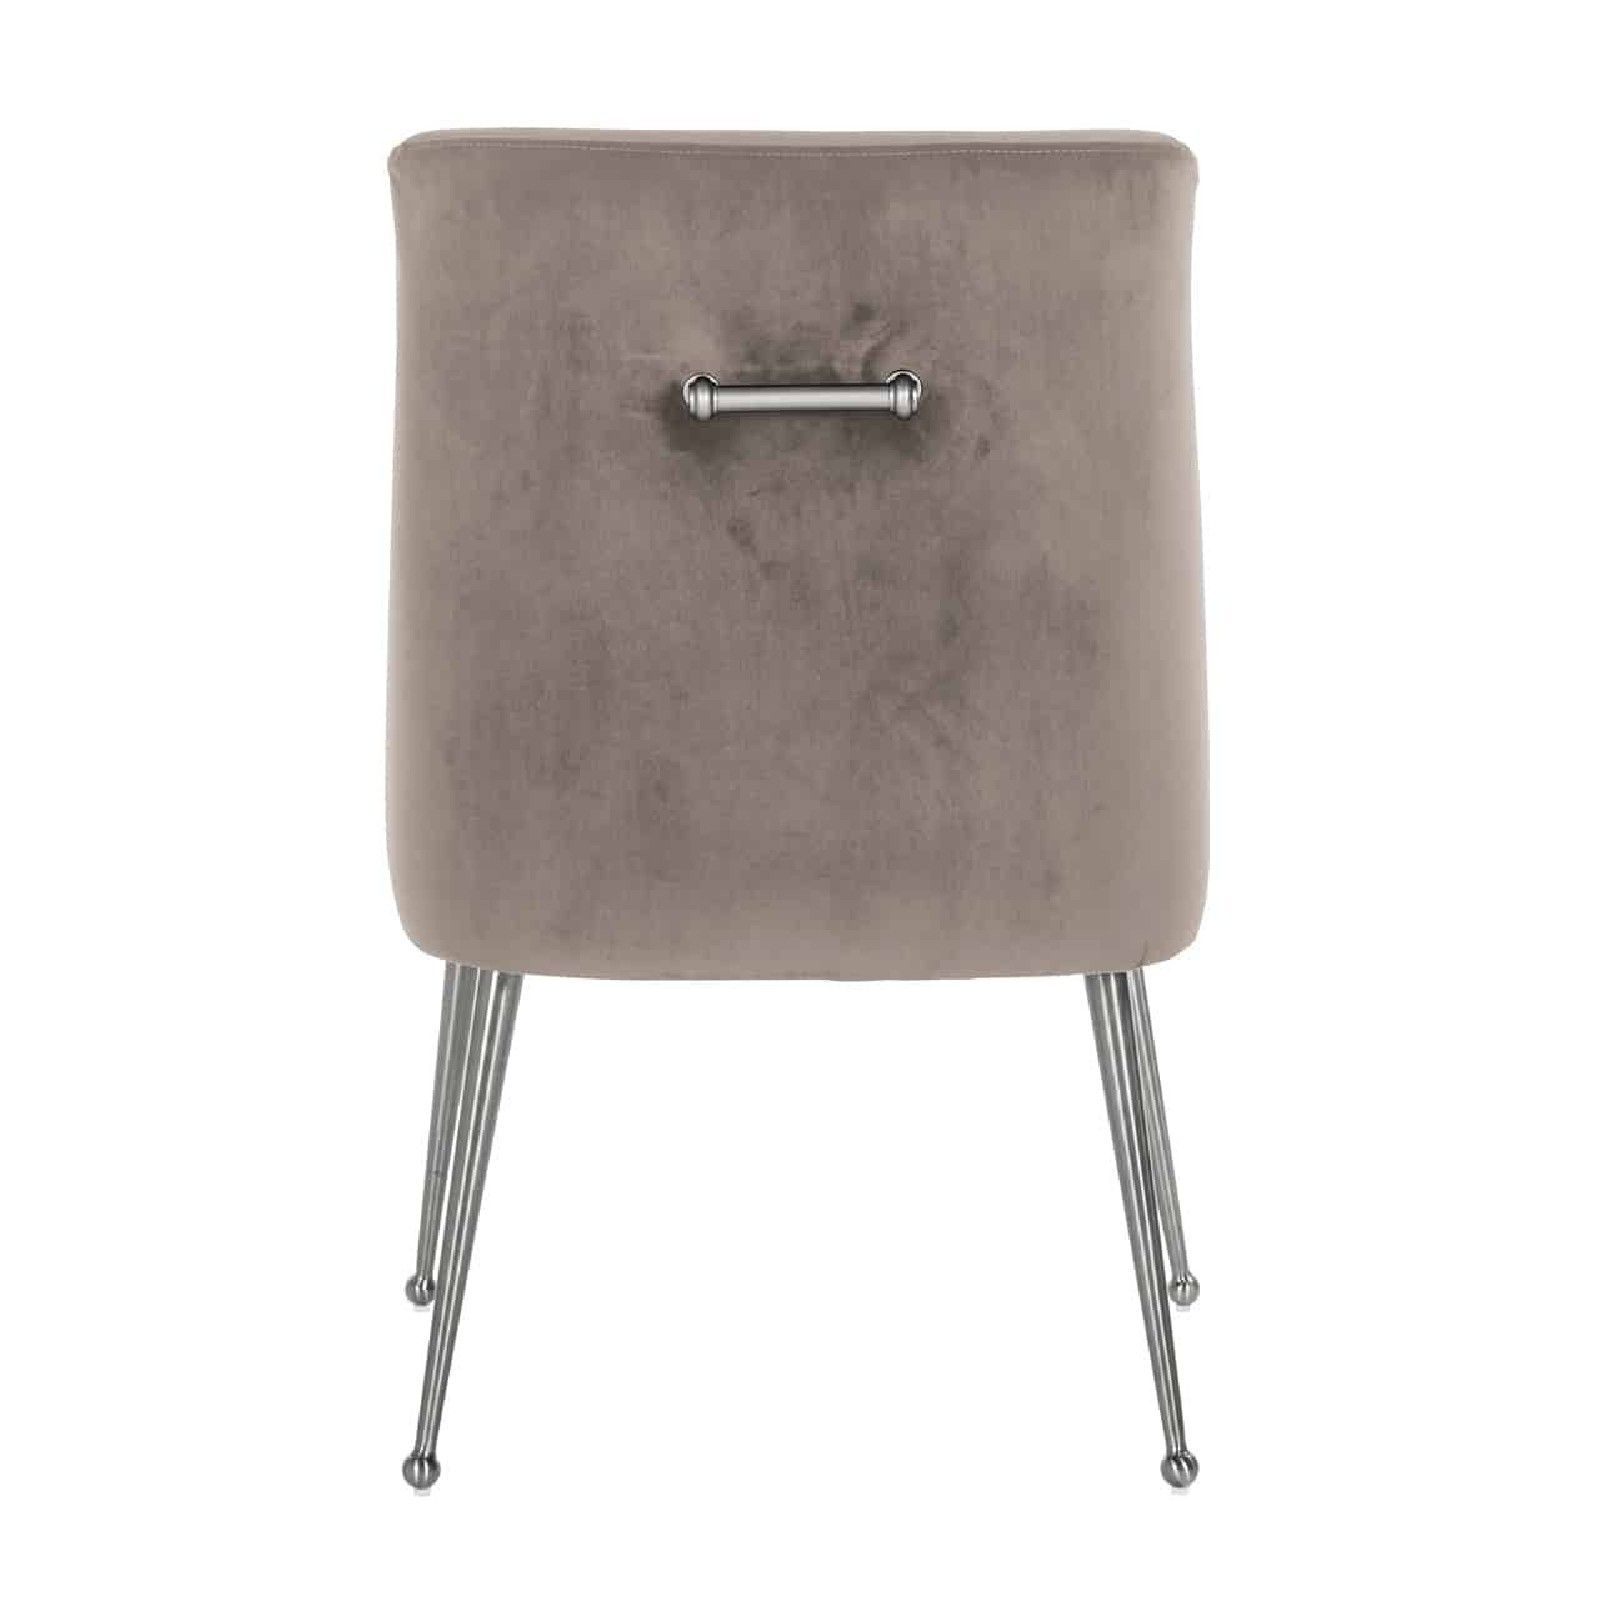 Chaise Indy Khaki velvet/ argentée Salle à manger - 121